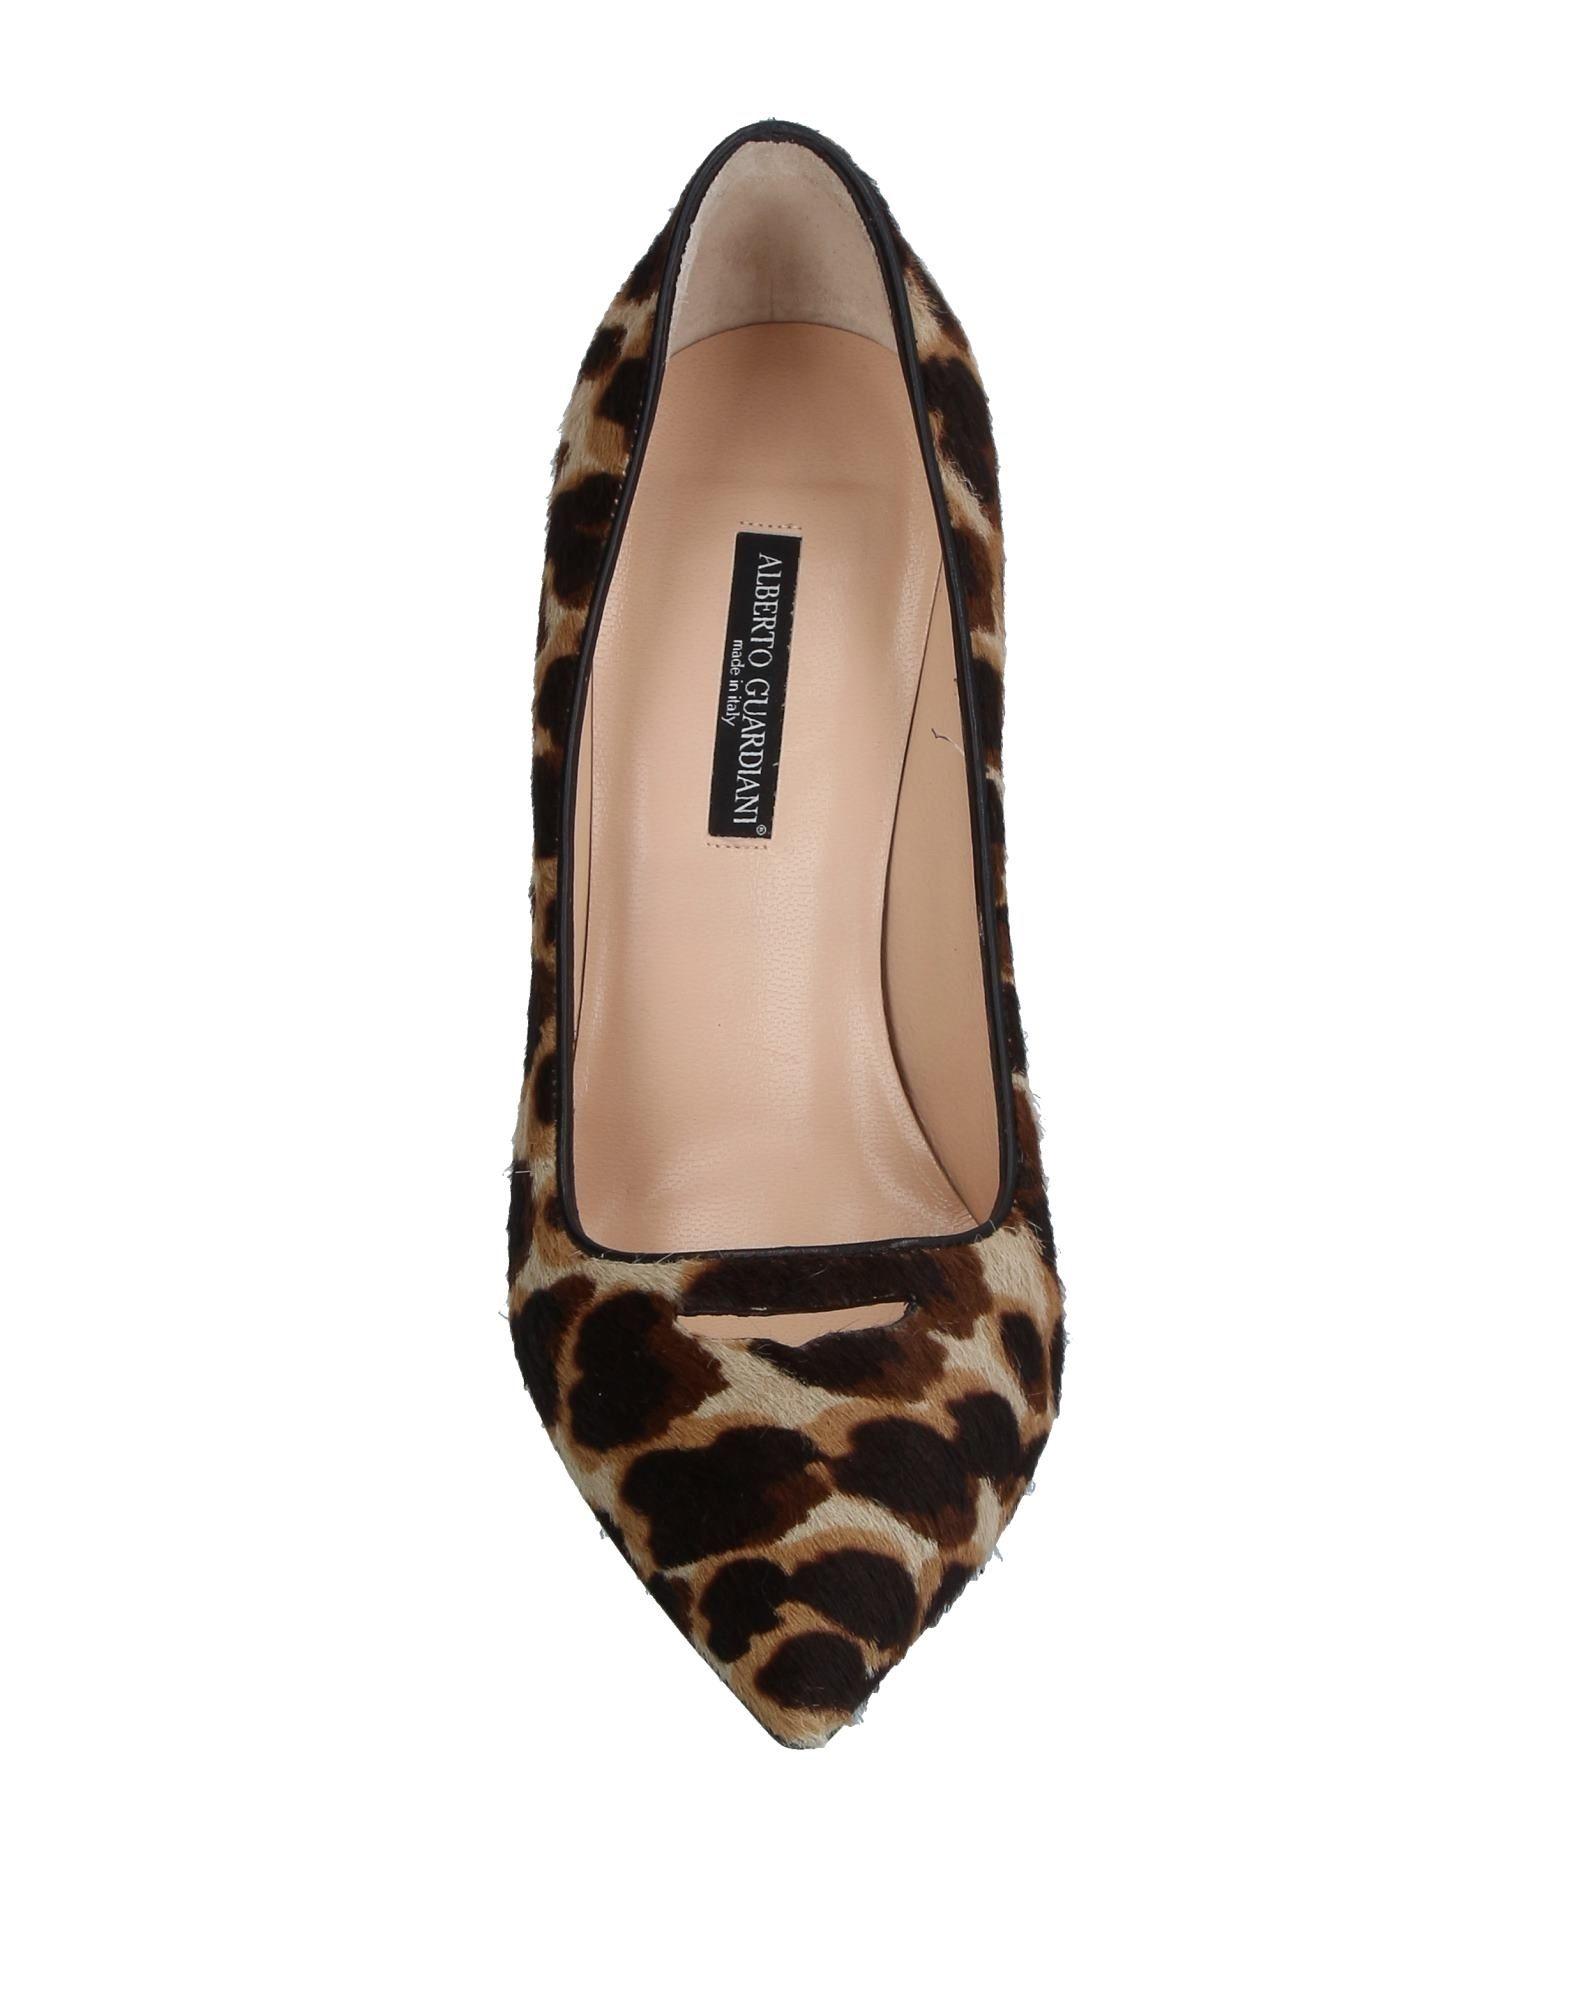 Stilvolle Pumps billige Schuhe Alberto Guardiani Pumps Stilvolle Damen  11241470SX be8233